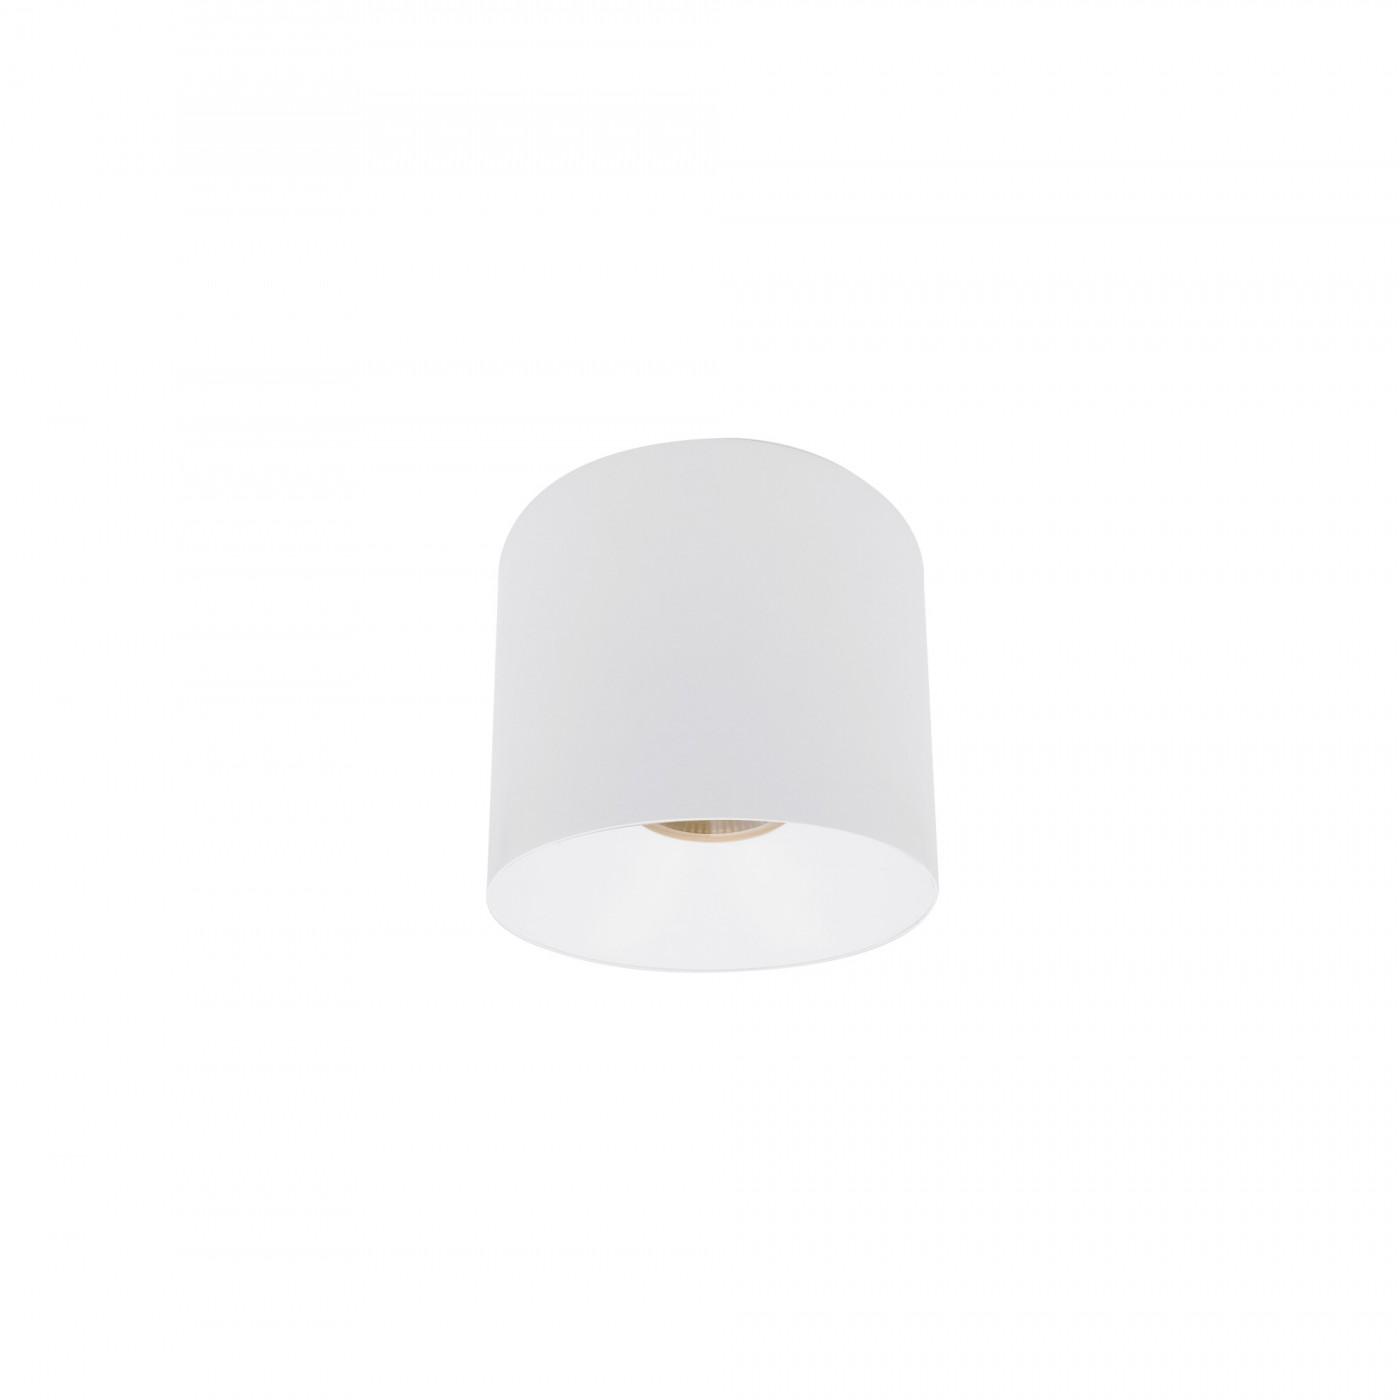 CL IOS LED 40W 4000K white 8725 Nowodvorski Lighting